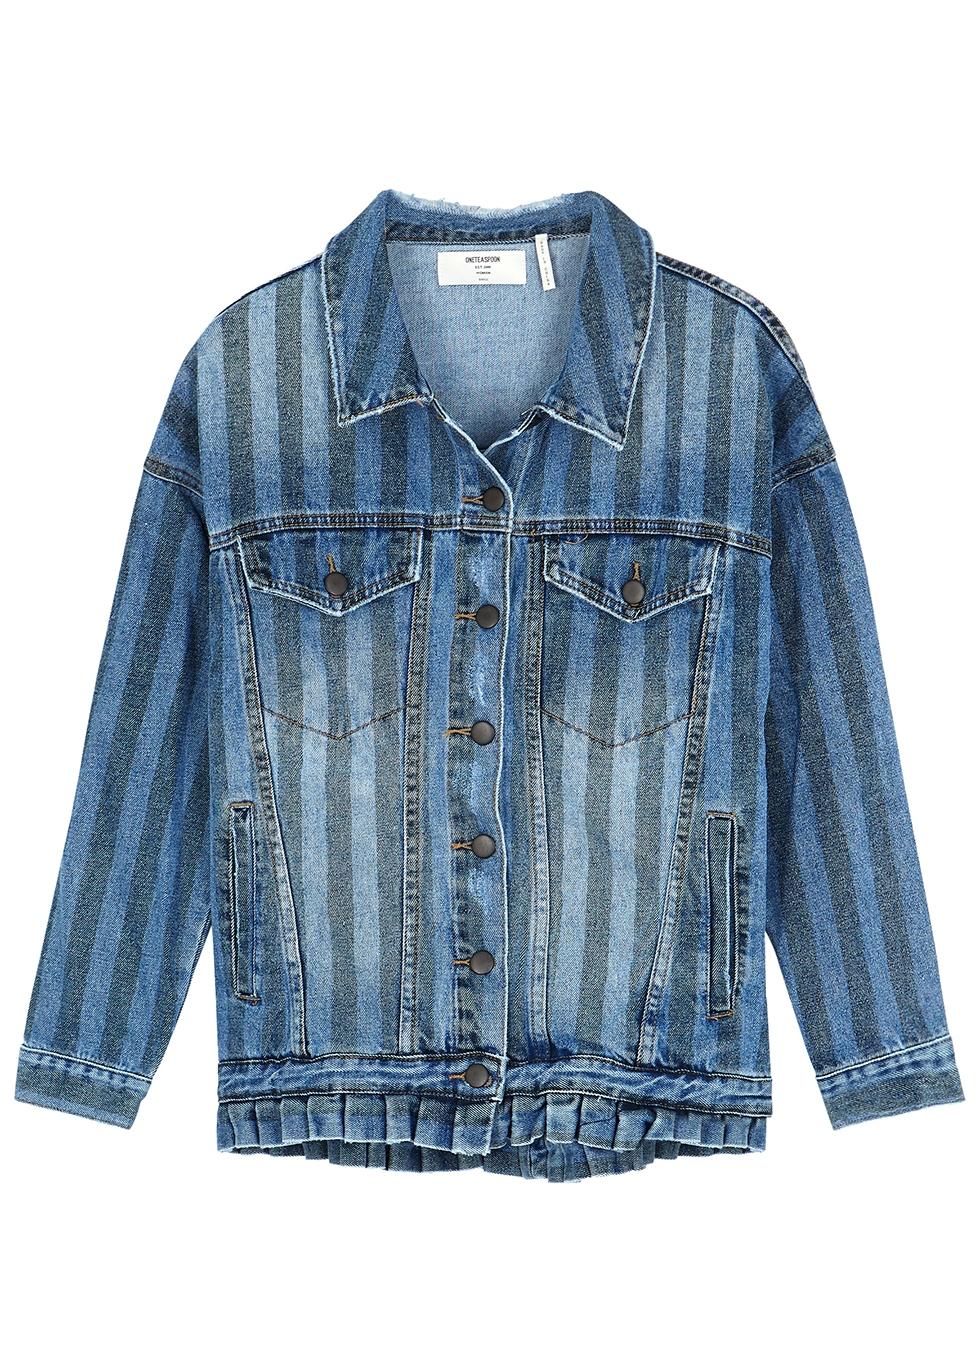 Blue striped denim jacket - Oneteaspoon